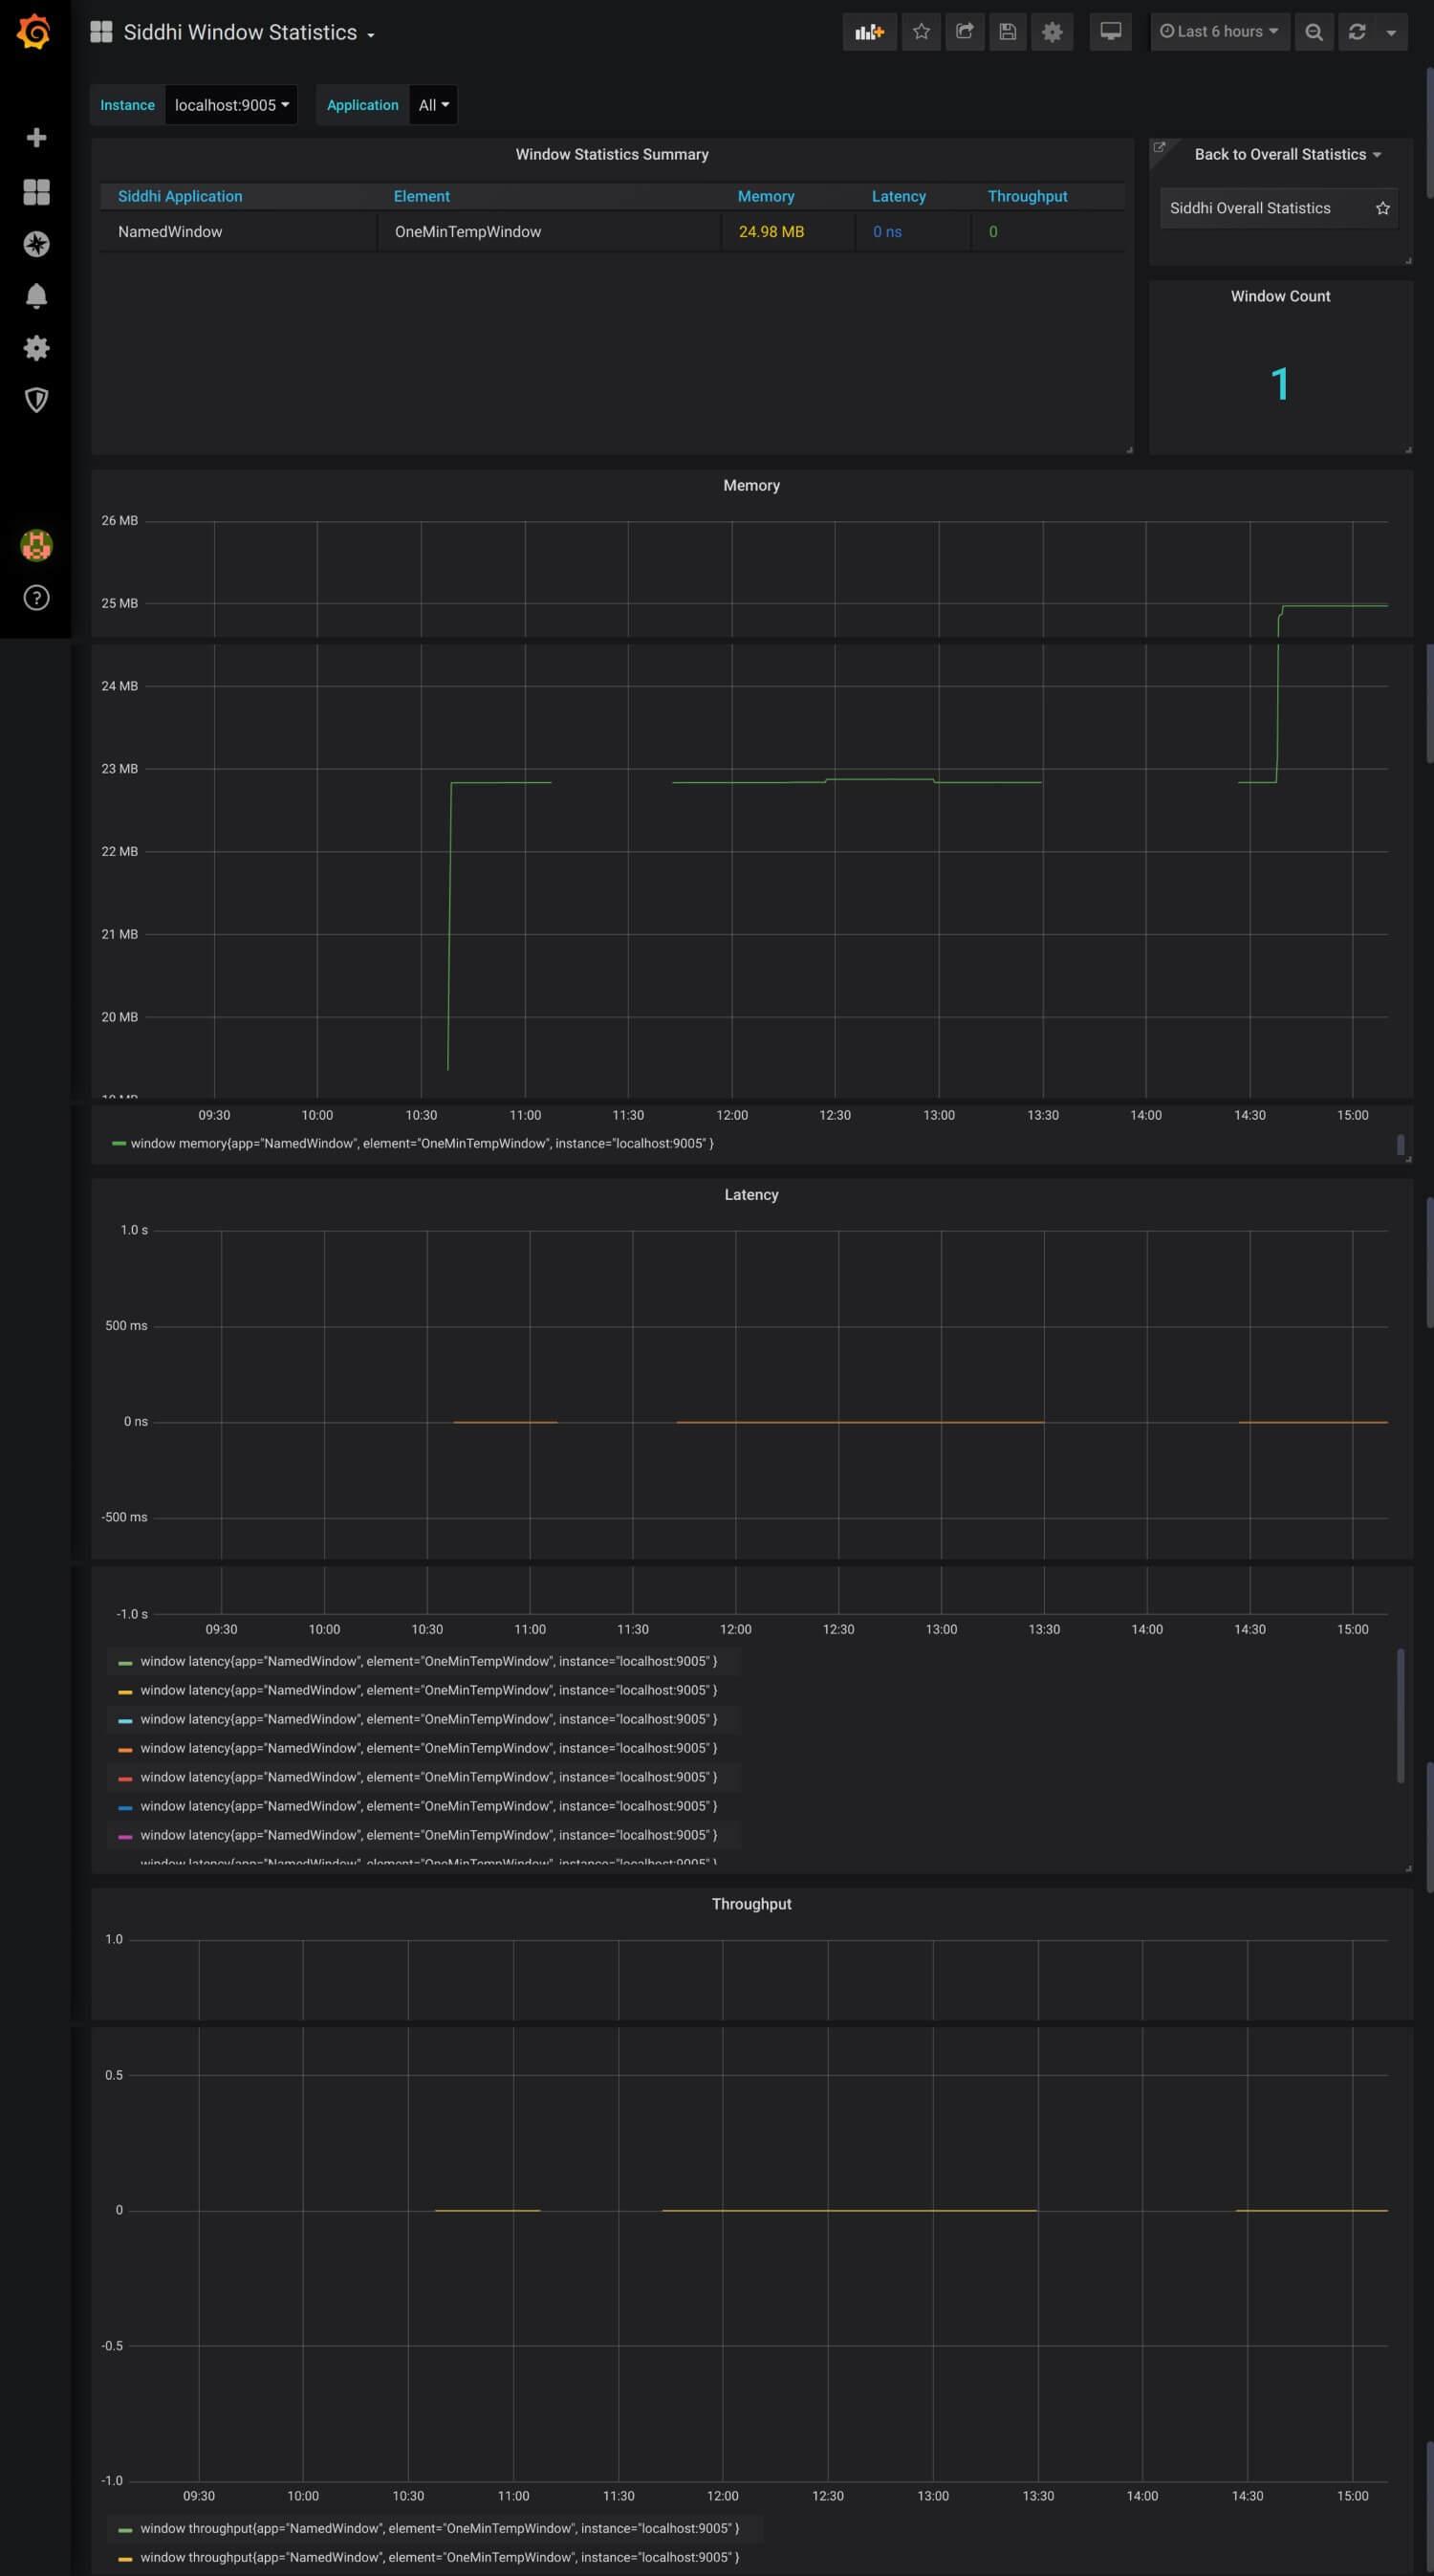 Window statistics dashboard